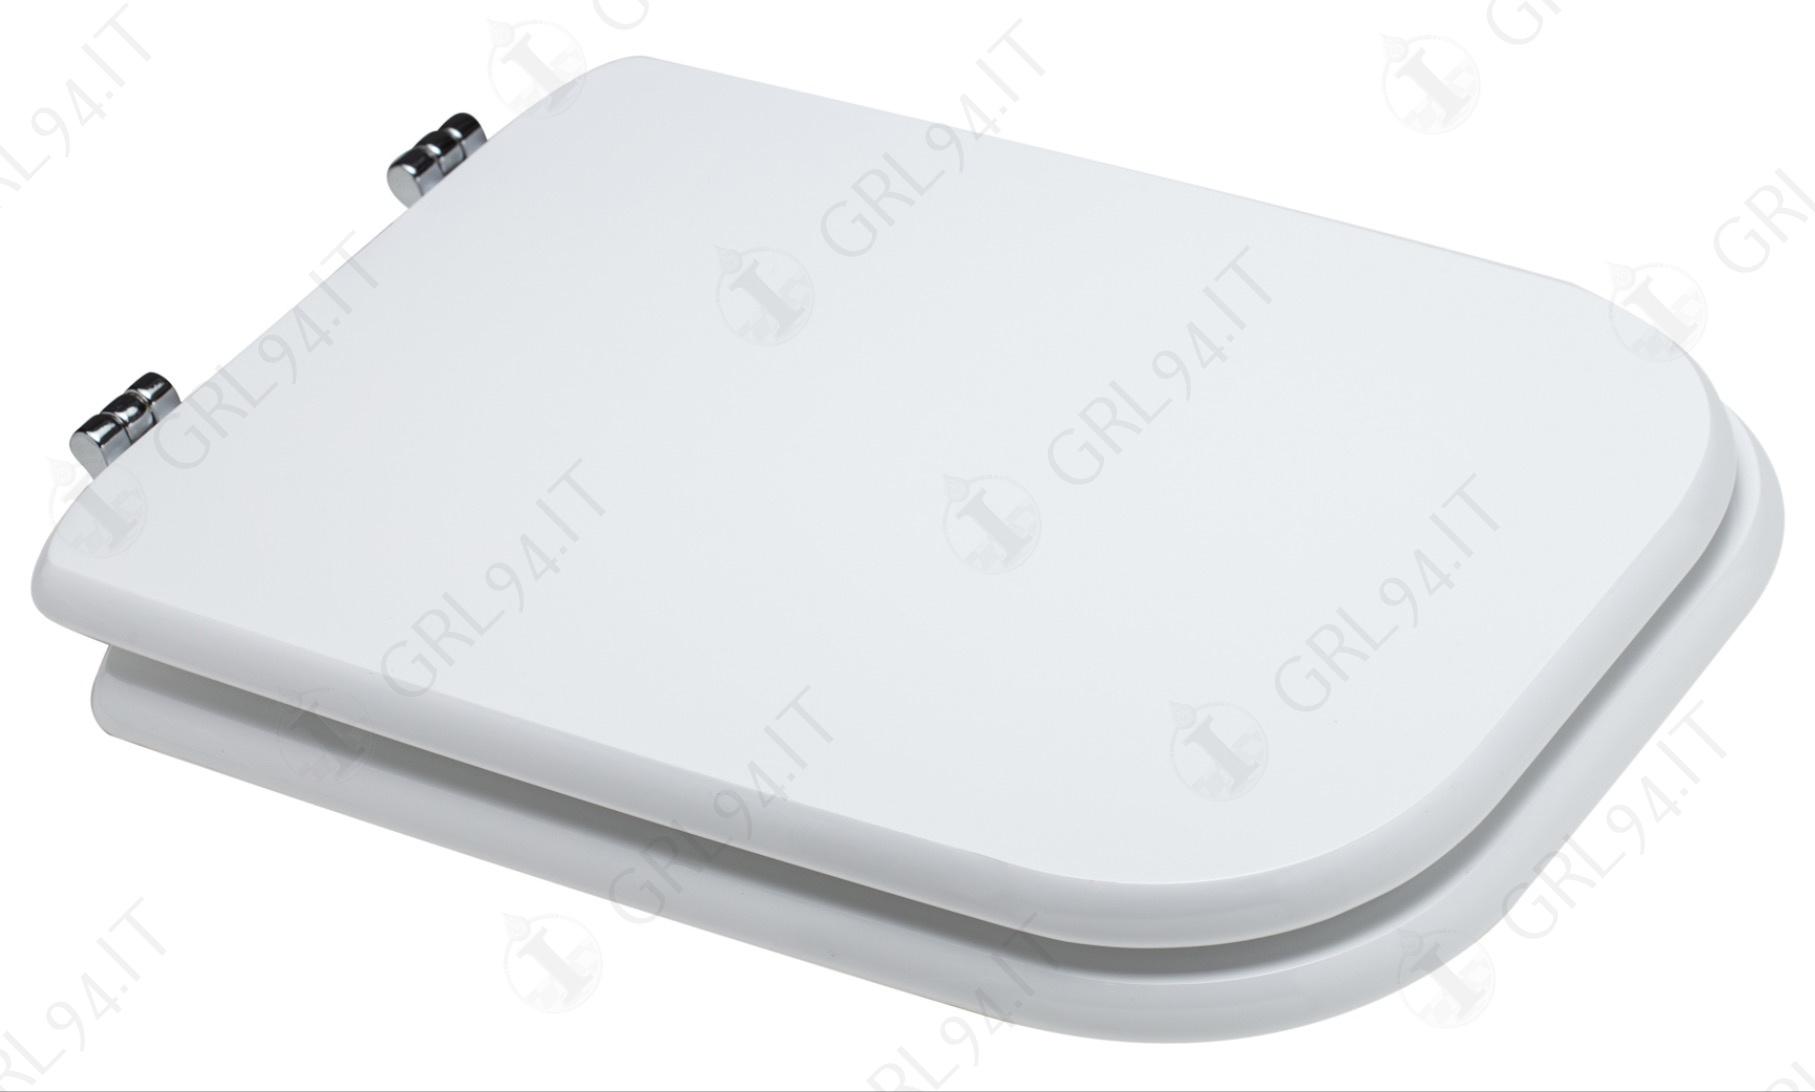 Ideal Standard Sedile Conca.Sedile Copriwc Conca Ideal Standard Bianco Lucido Grl94 It